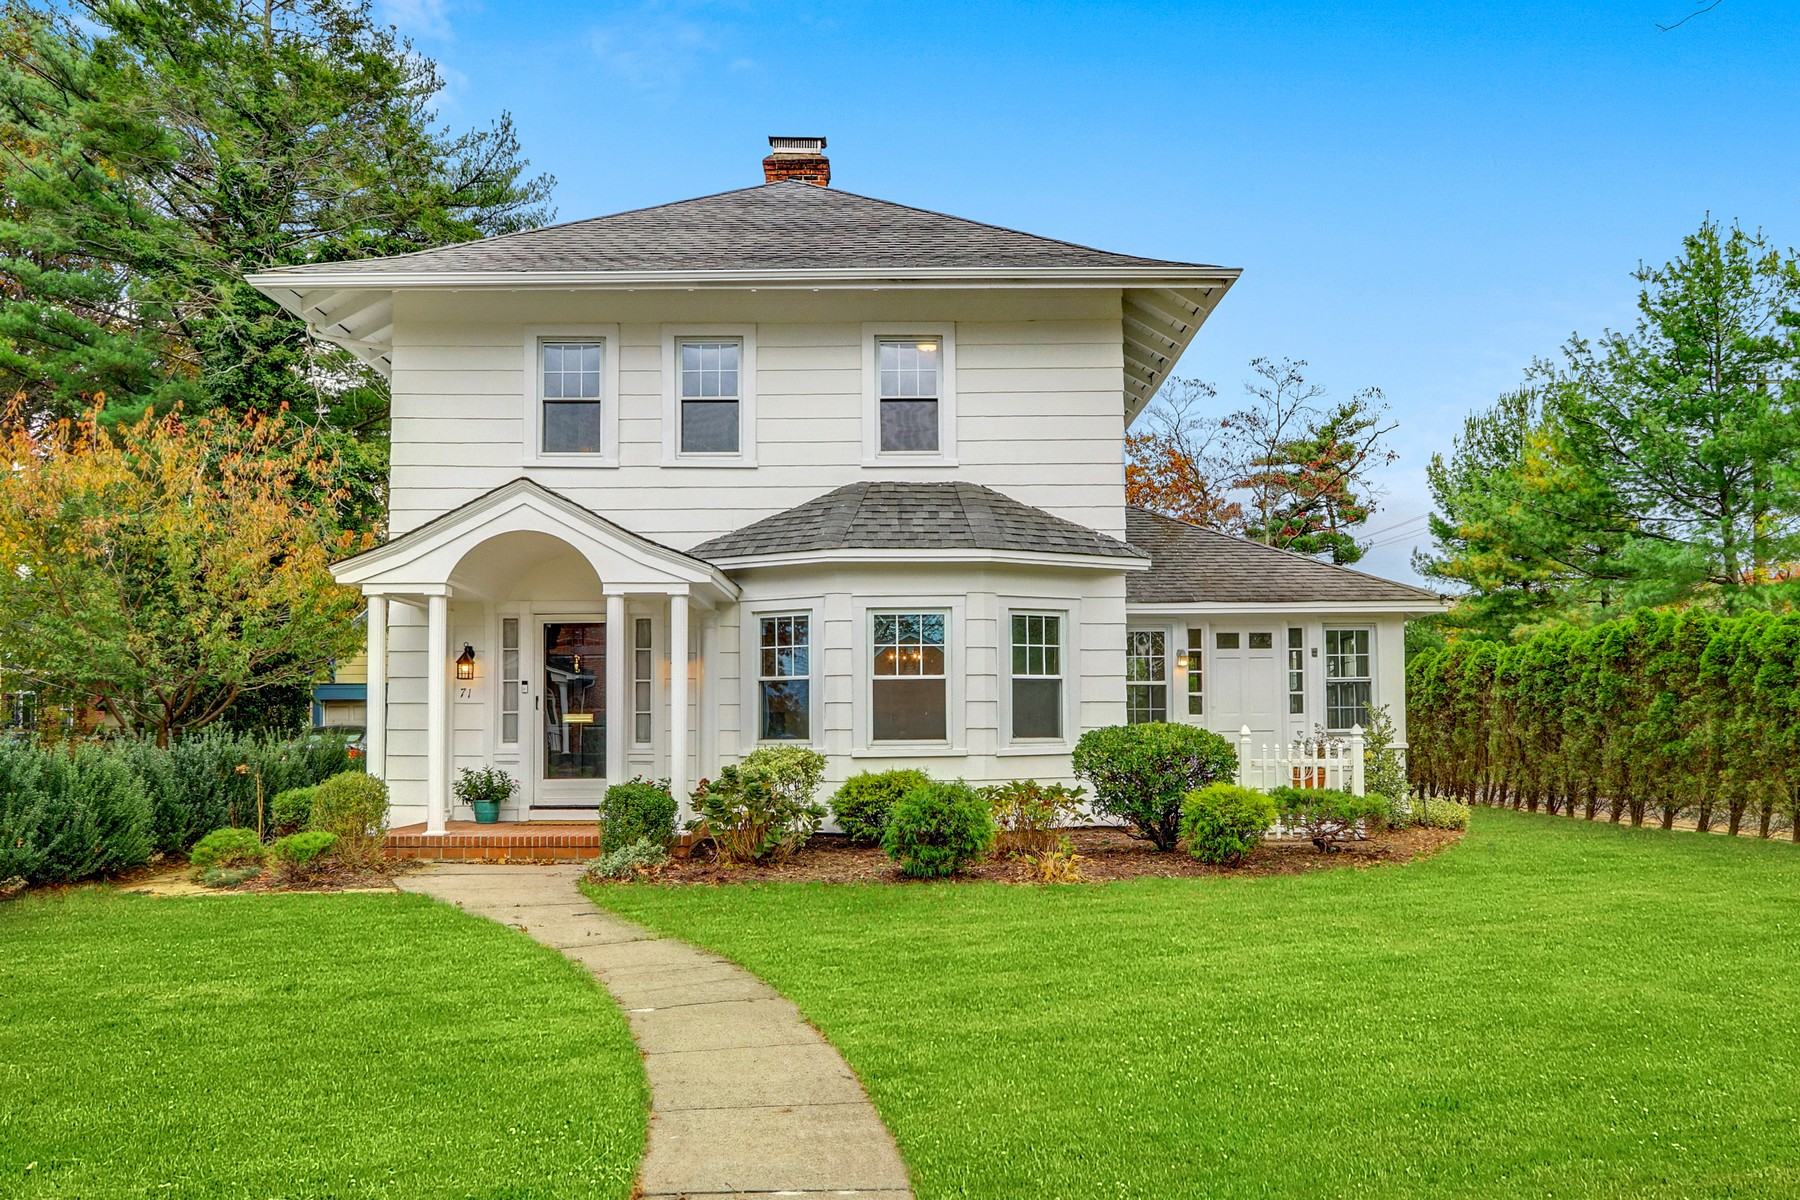 Single Family Homes for Sale at Garden City 71 Roxbury Garden City, New York 11530 United States